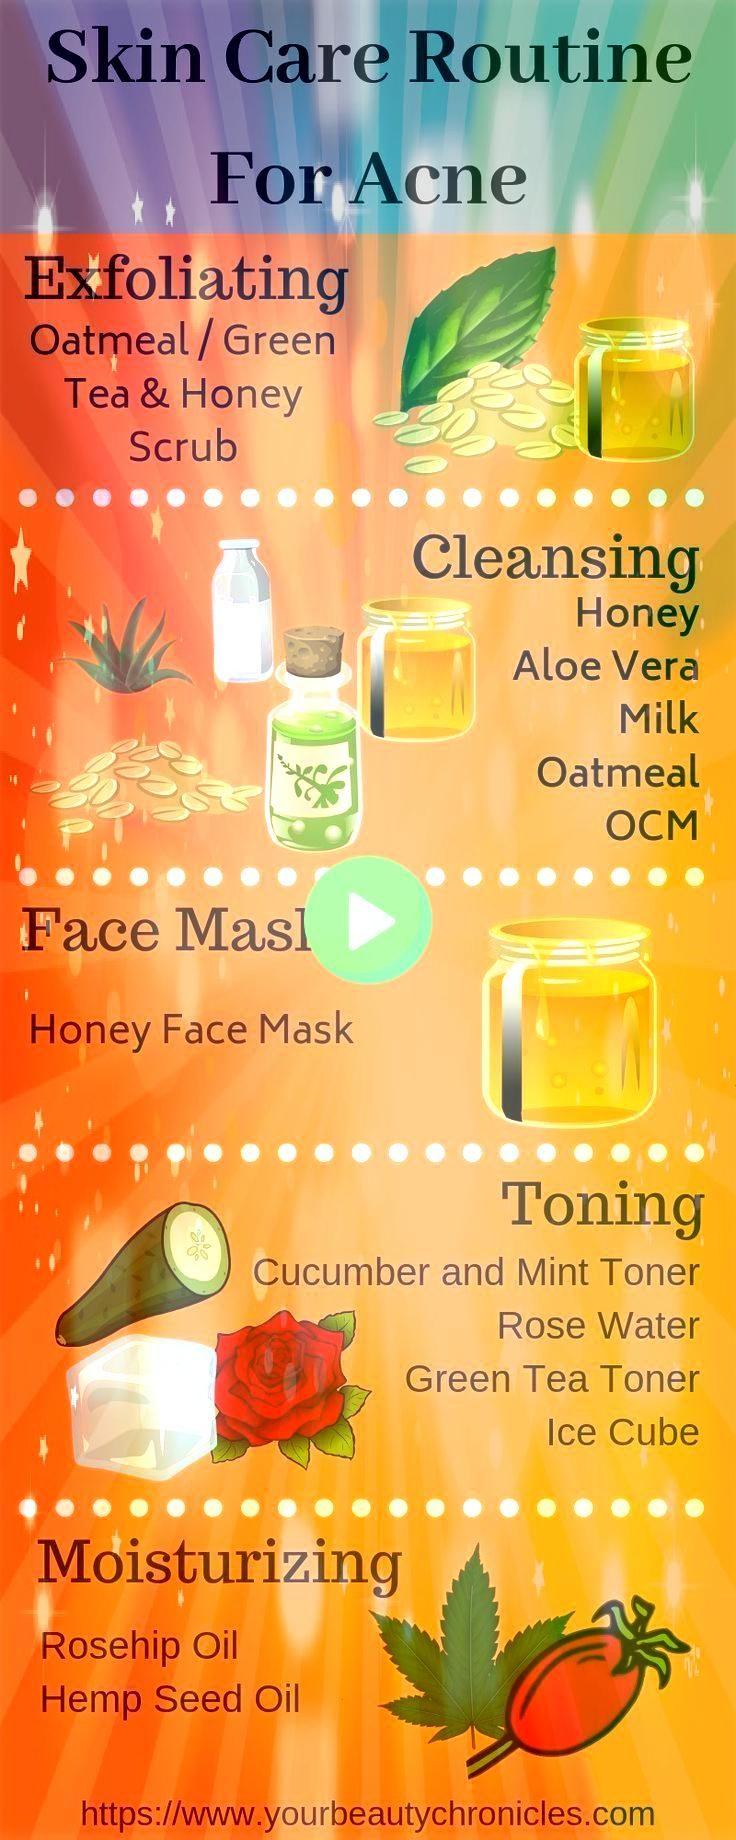 All Natural Skin Care Routine für Akne  Face  Die All Natural Skin Care Routine für Akne  Face  Die All Natural Skin Care Routine für Akne  Face  Die All N...